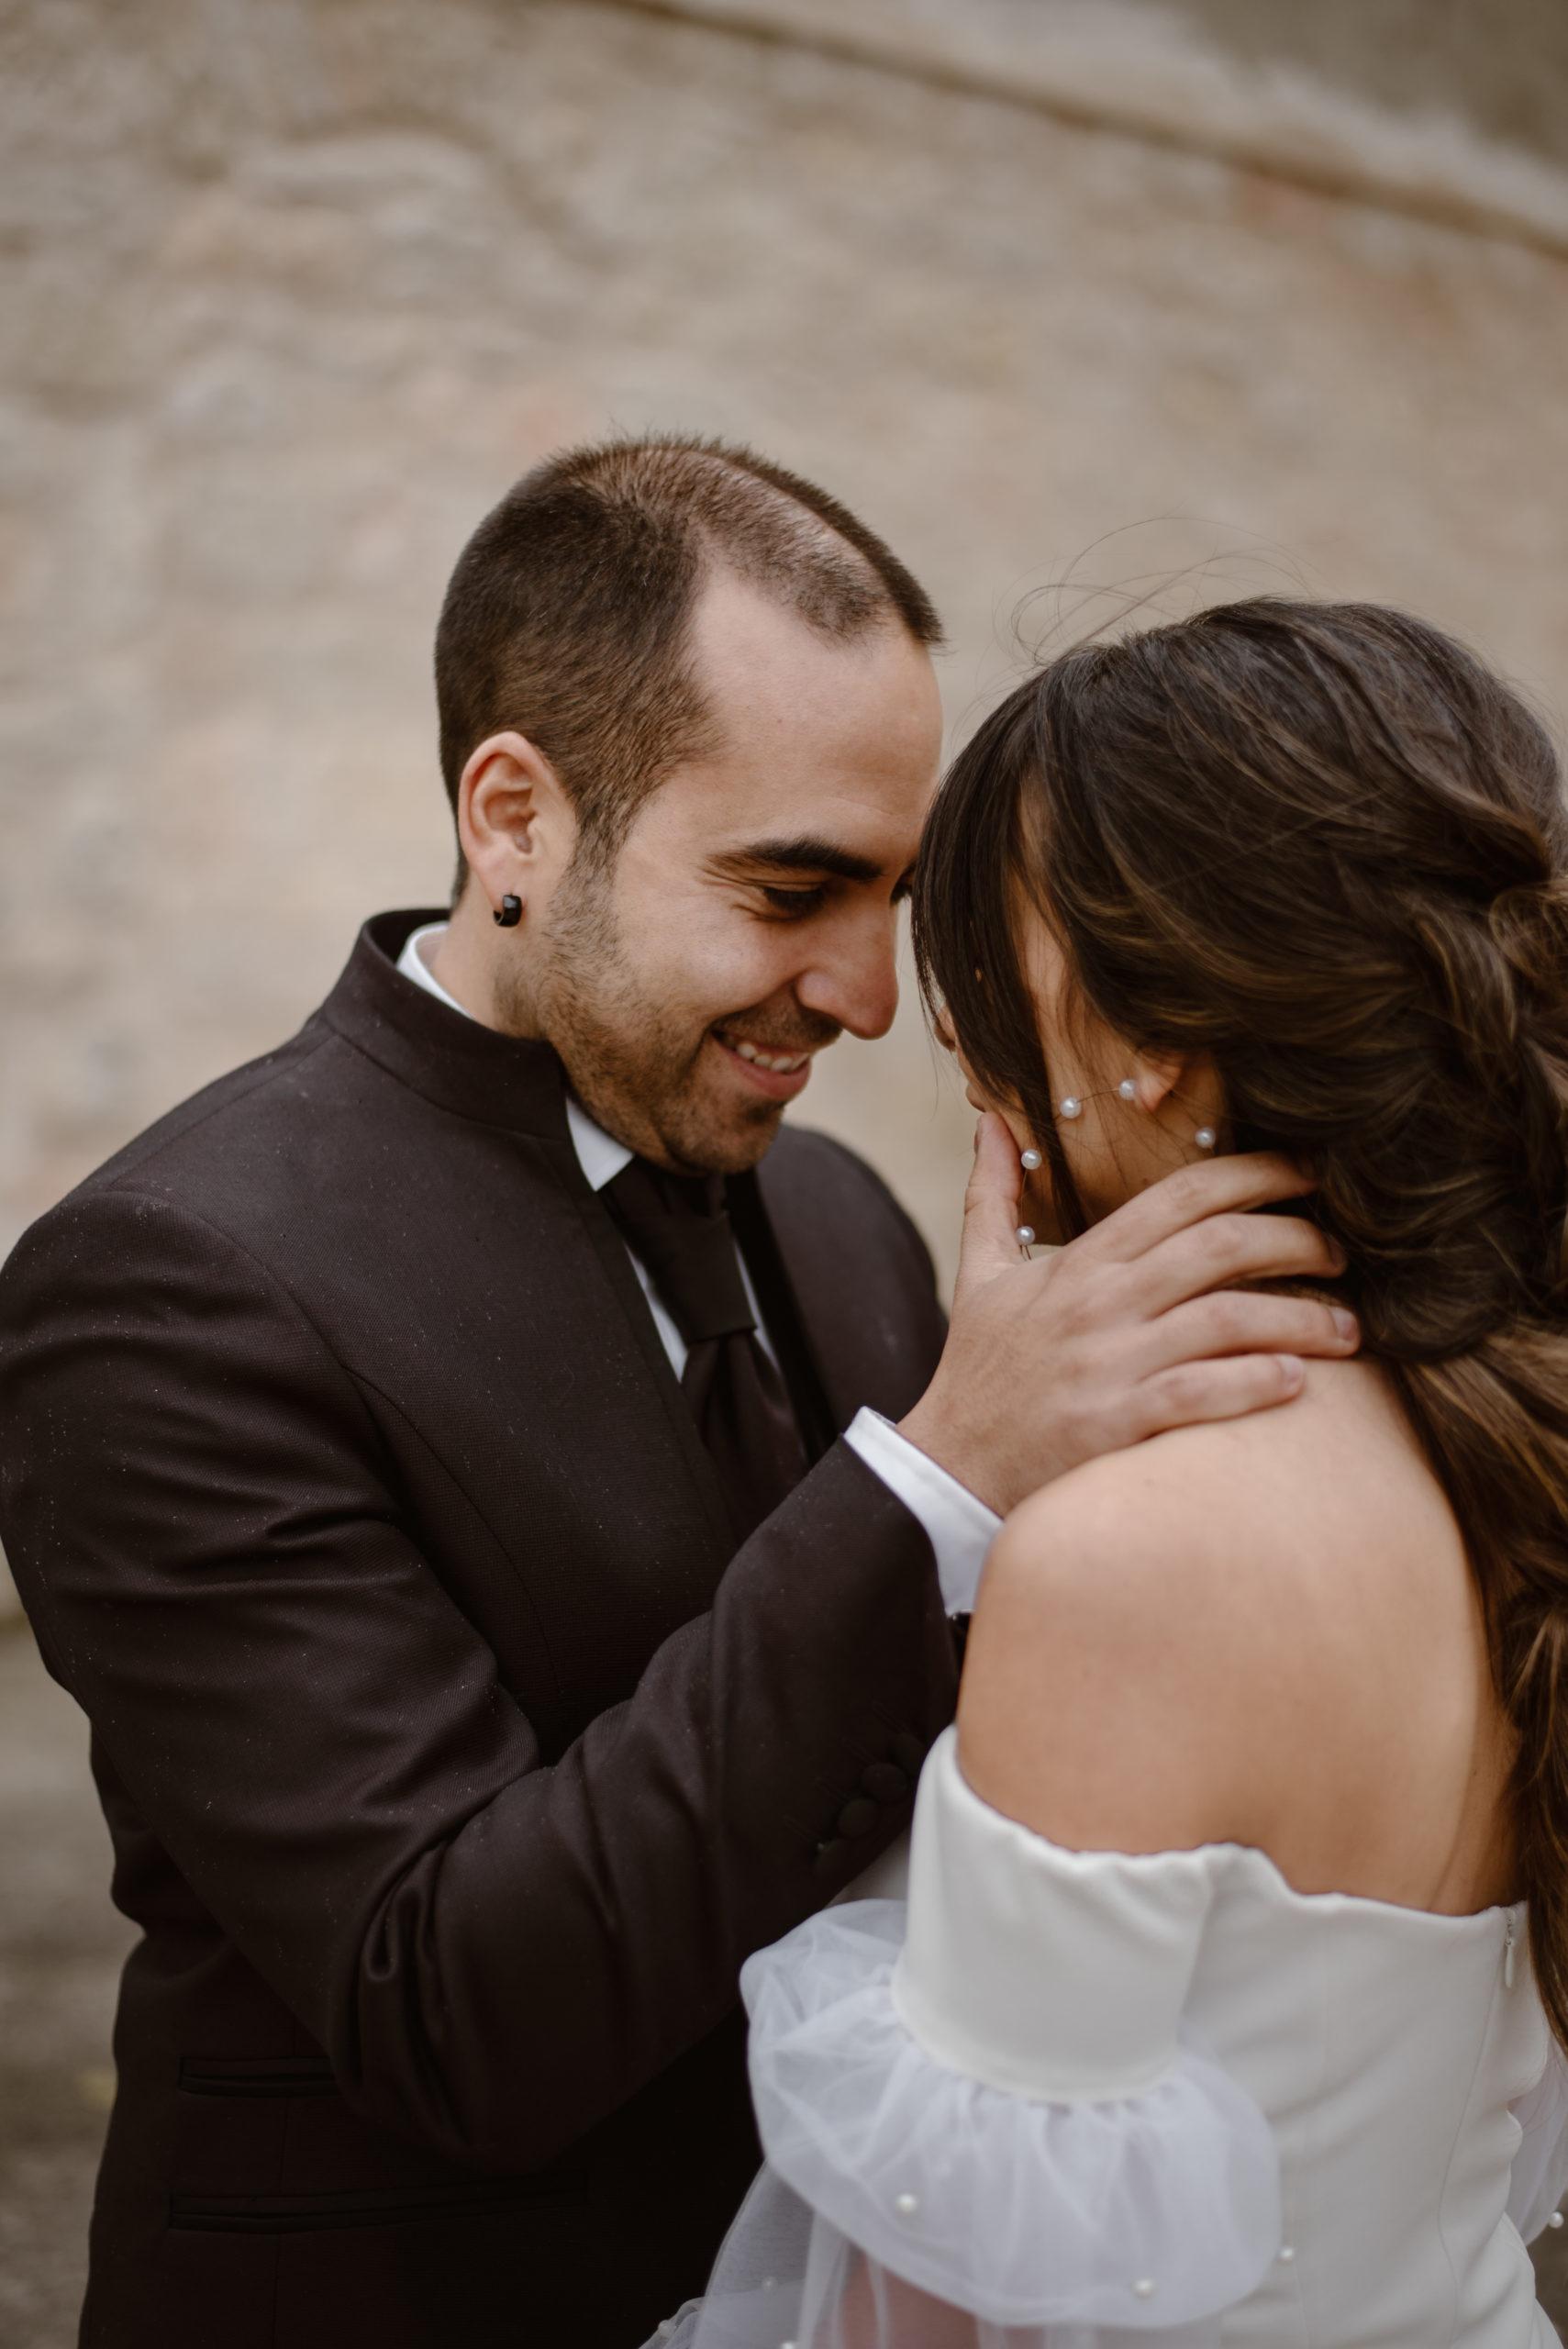 Novio acaricia a la novia